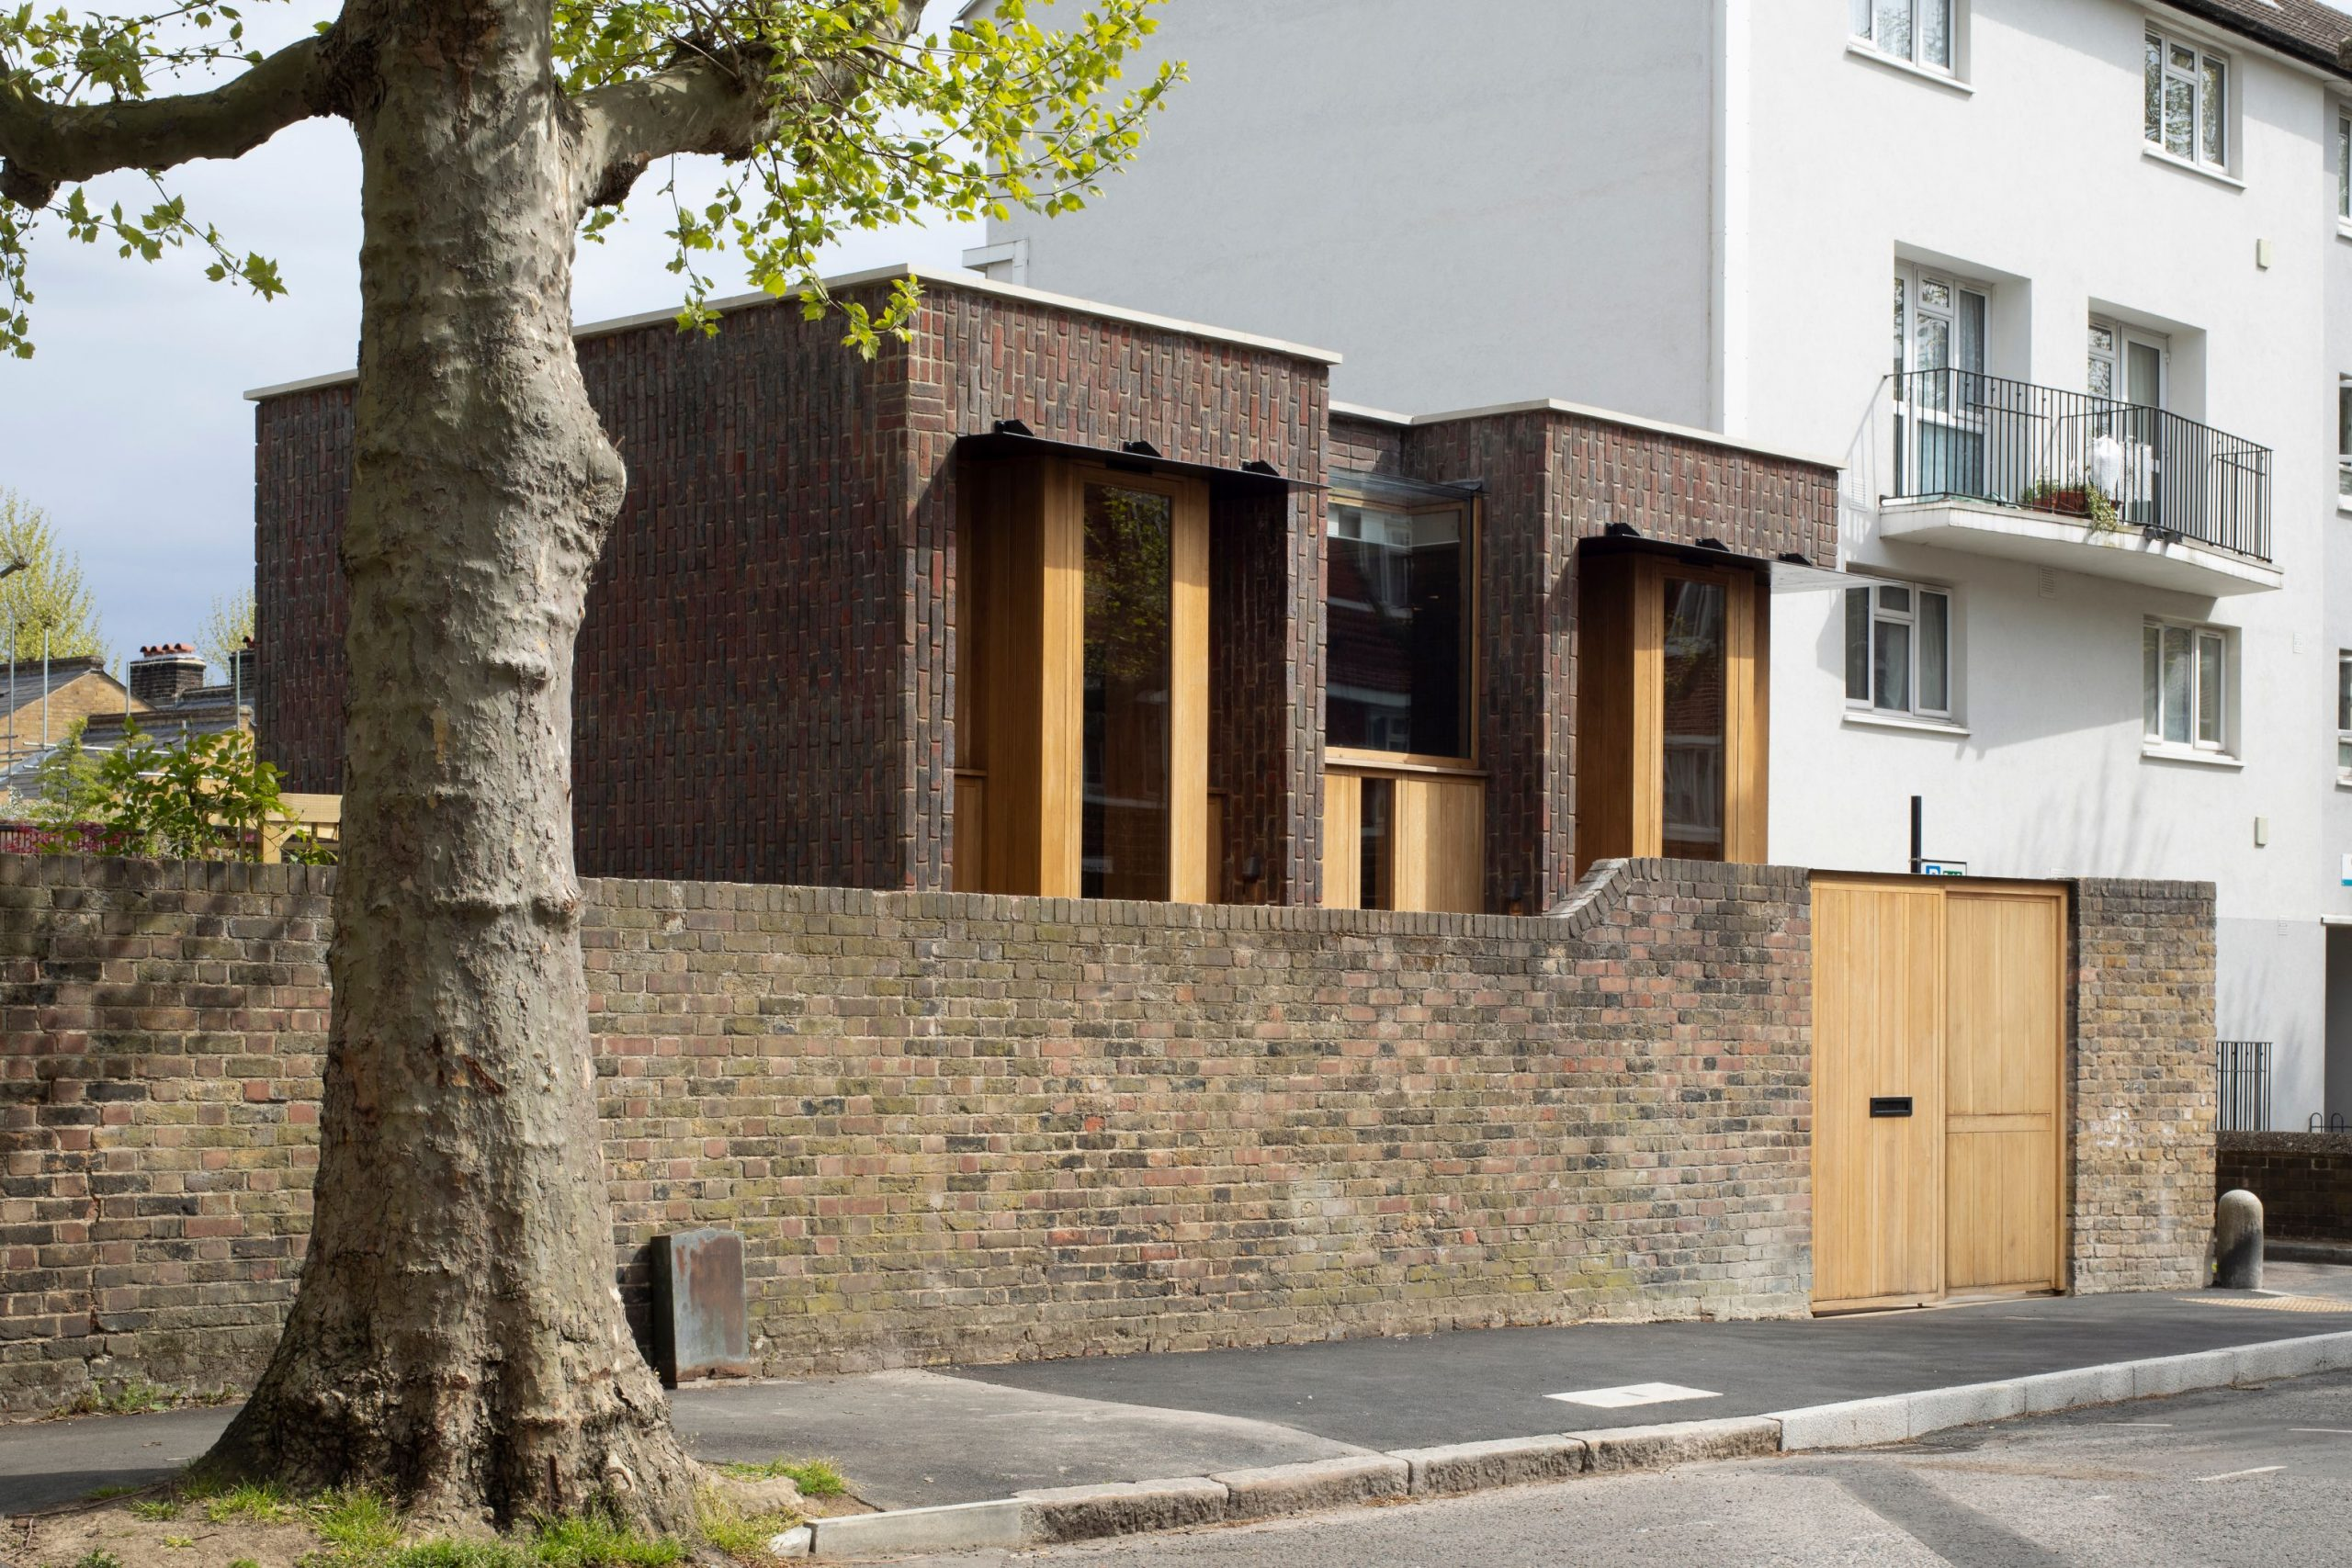 Brick_house4